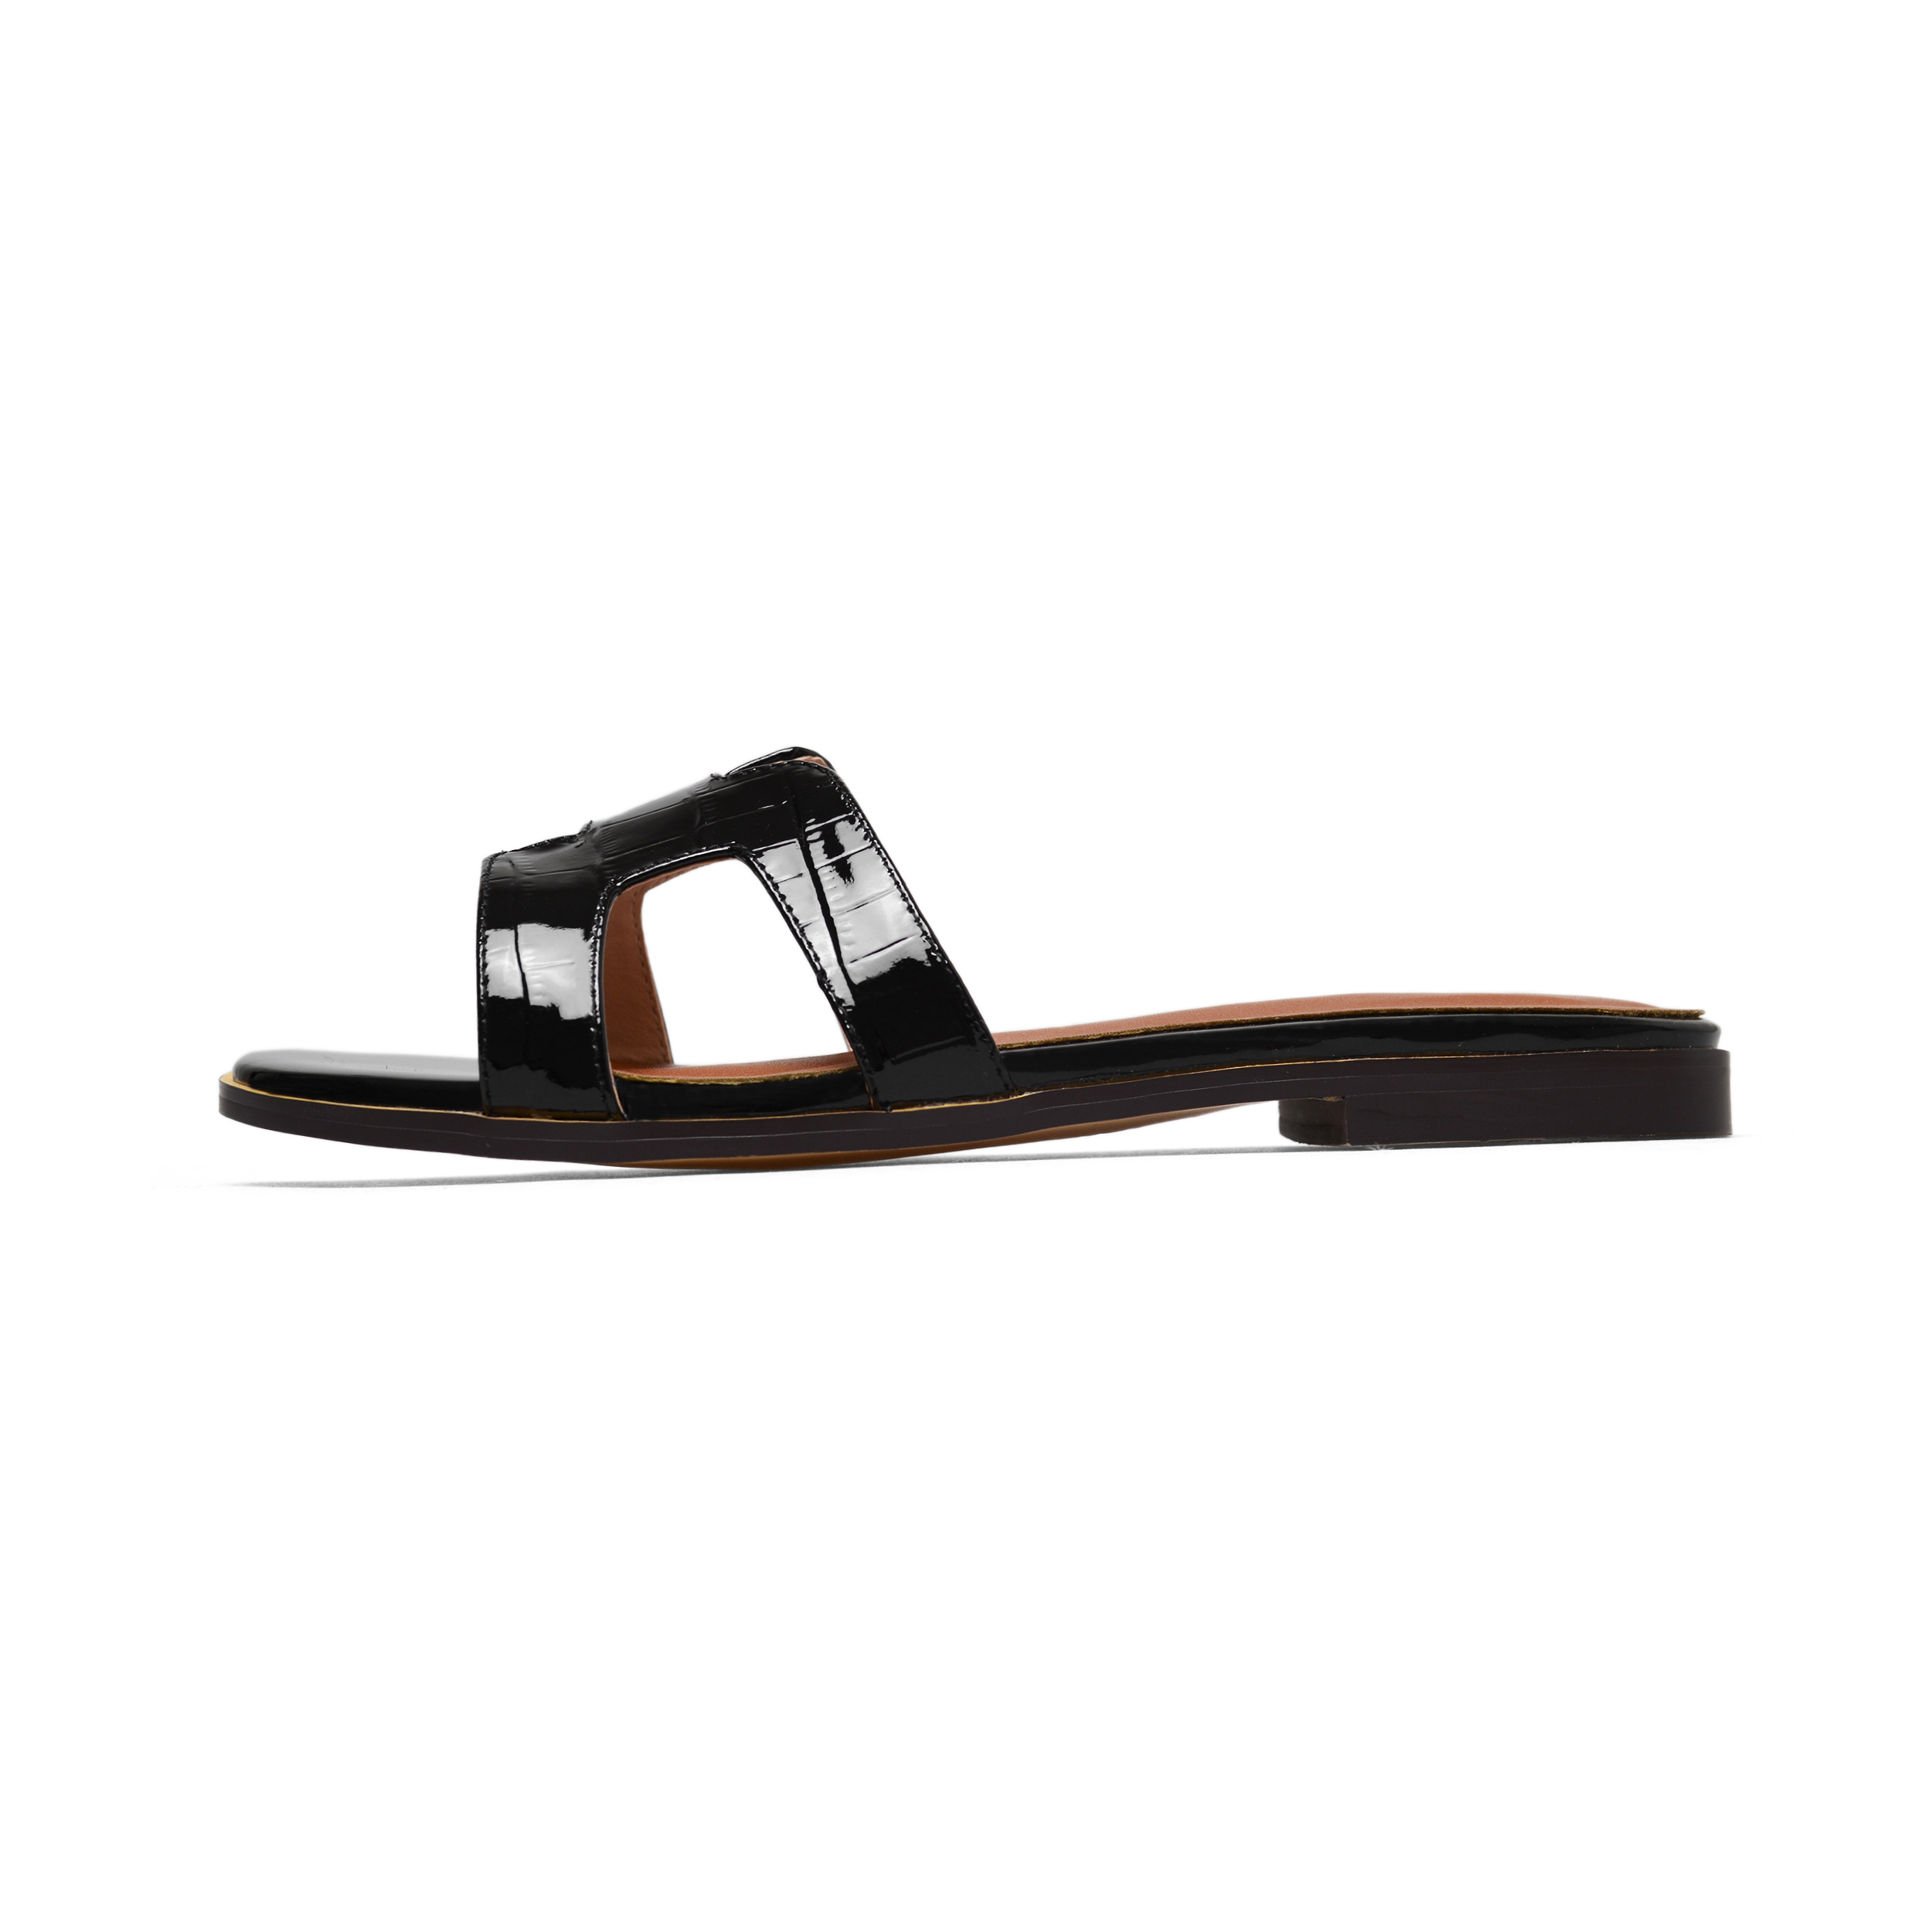 a7f897681 2018 summer flat H slippers genuine leather fashion slides big size ladies  slides home flip-. Loading zoom